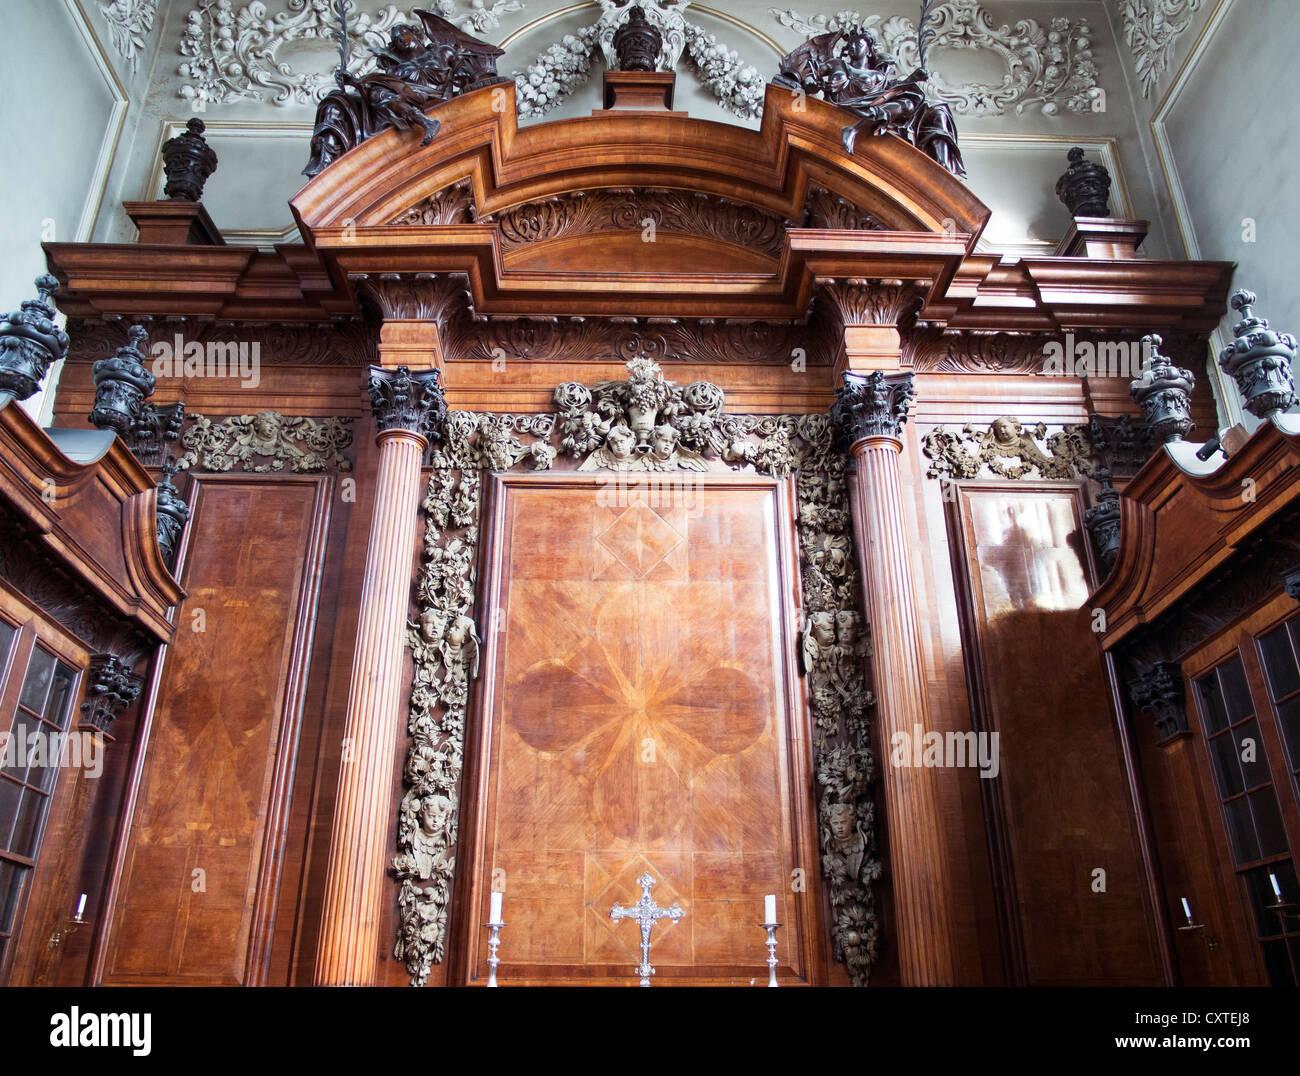 Interior of Trinity College Chapel, Oxford 5 - Stock Image